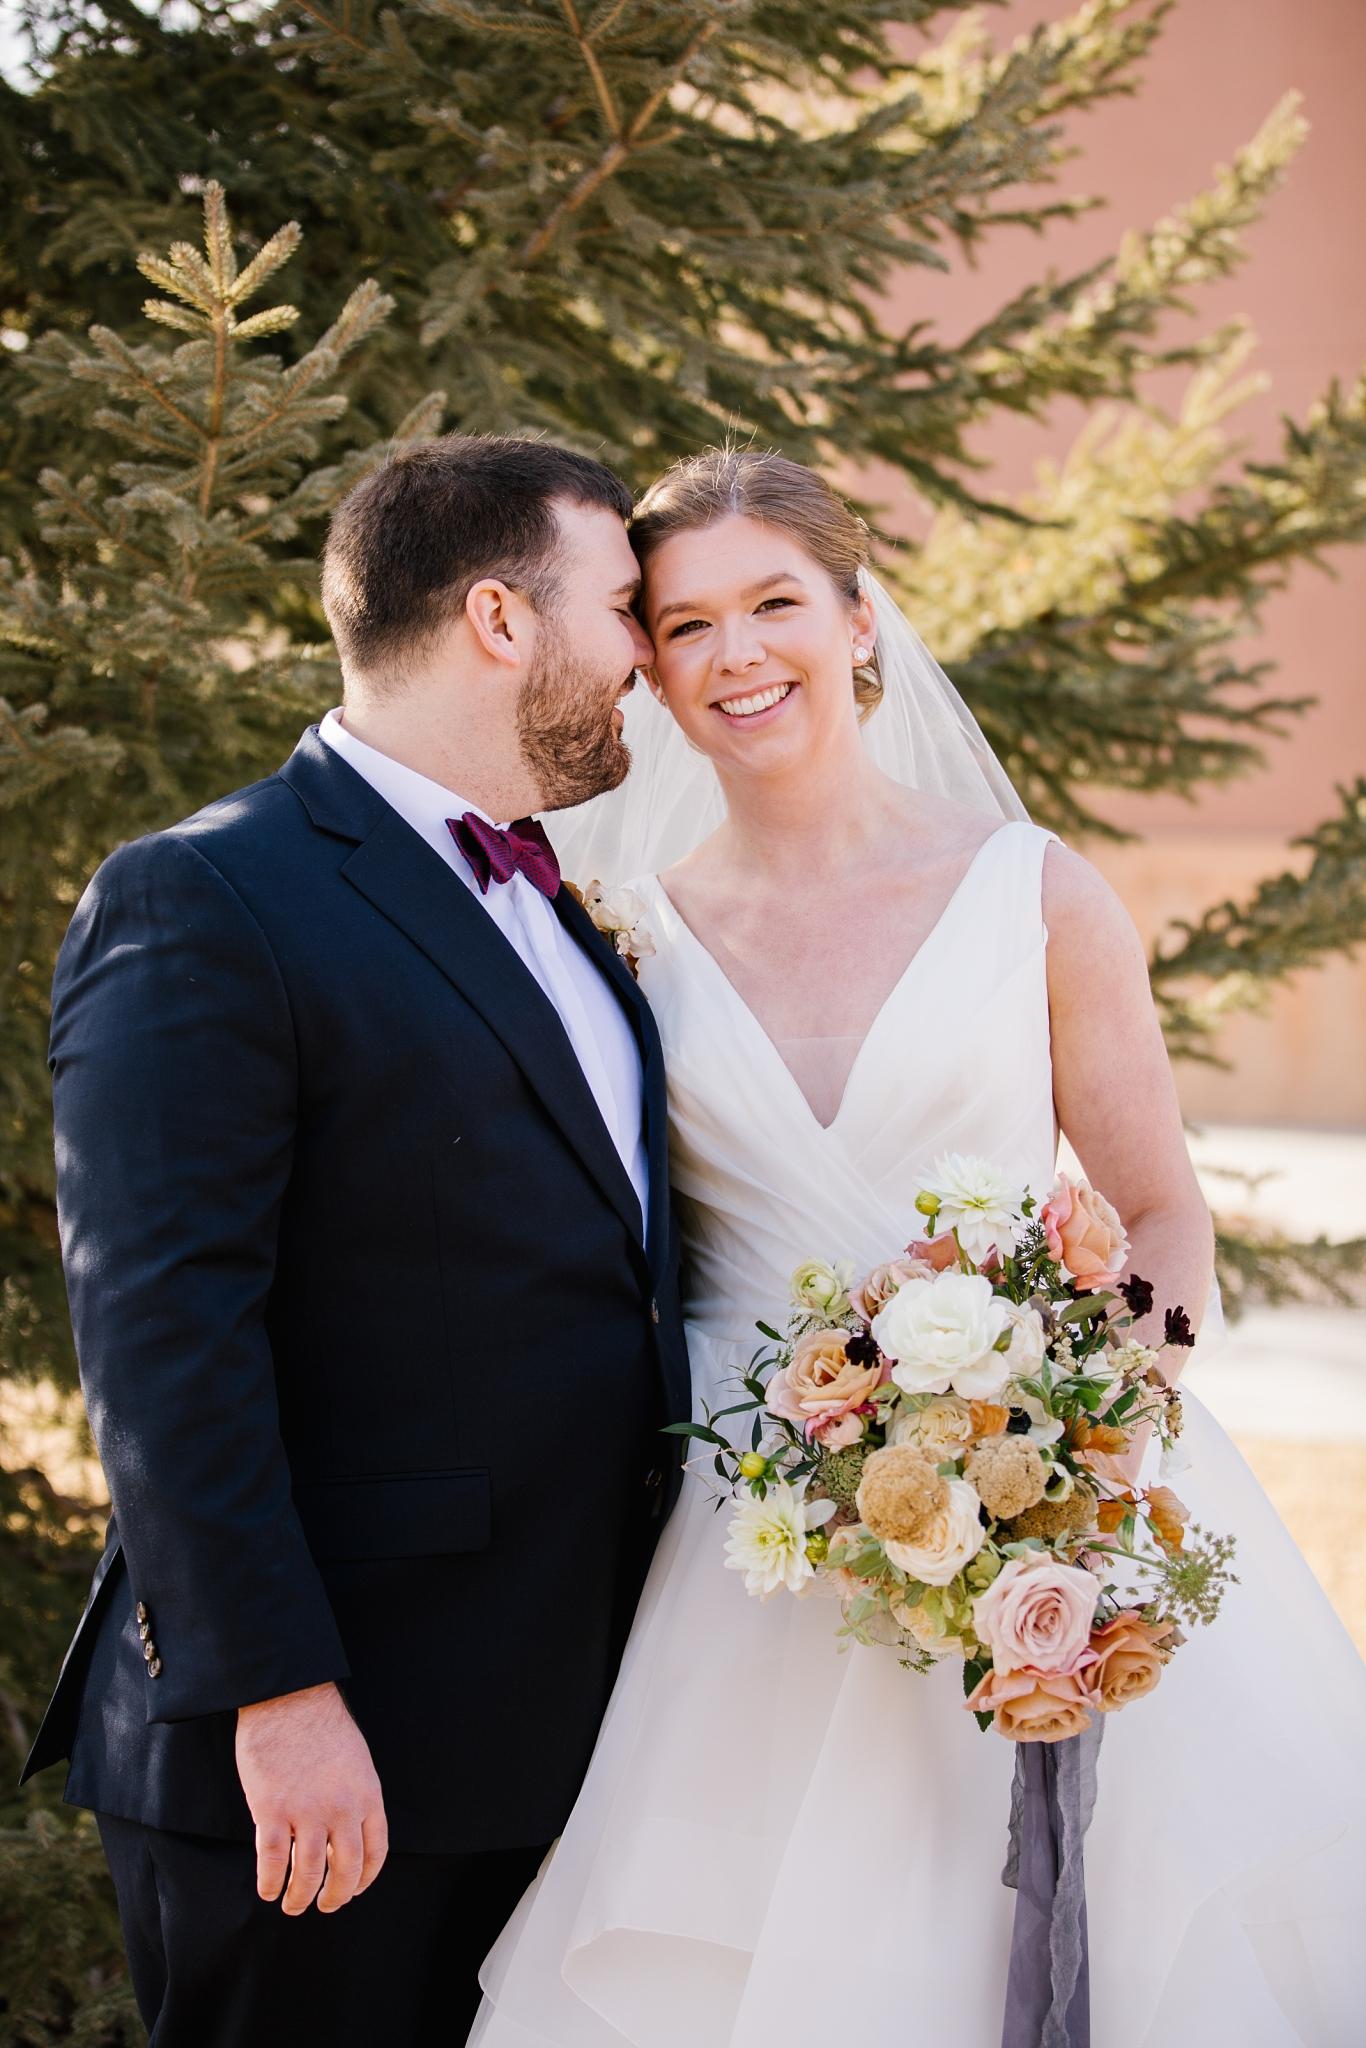 CN-Wedding-61_Lizzie-B-Imagery-Utah-Wedding-Photographer-Blessed-Sacrament-Catholic-Church-Sandy-Utah-The-Blended-Table-Salt-Lake-City.jpg